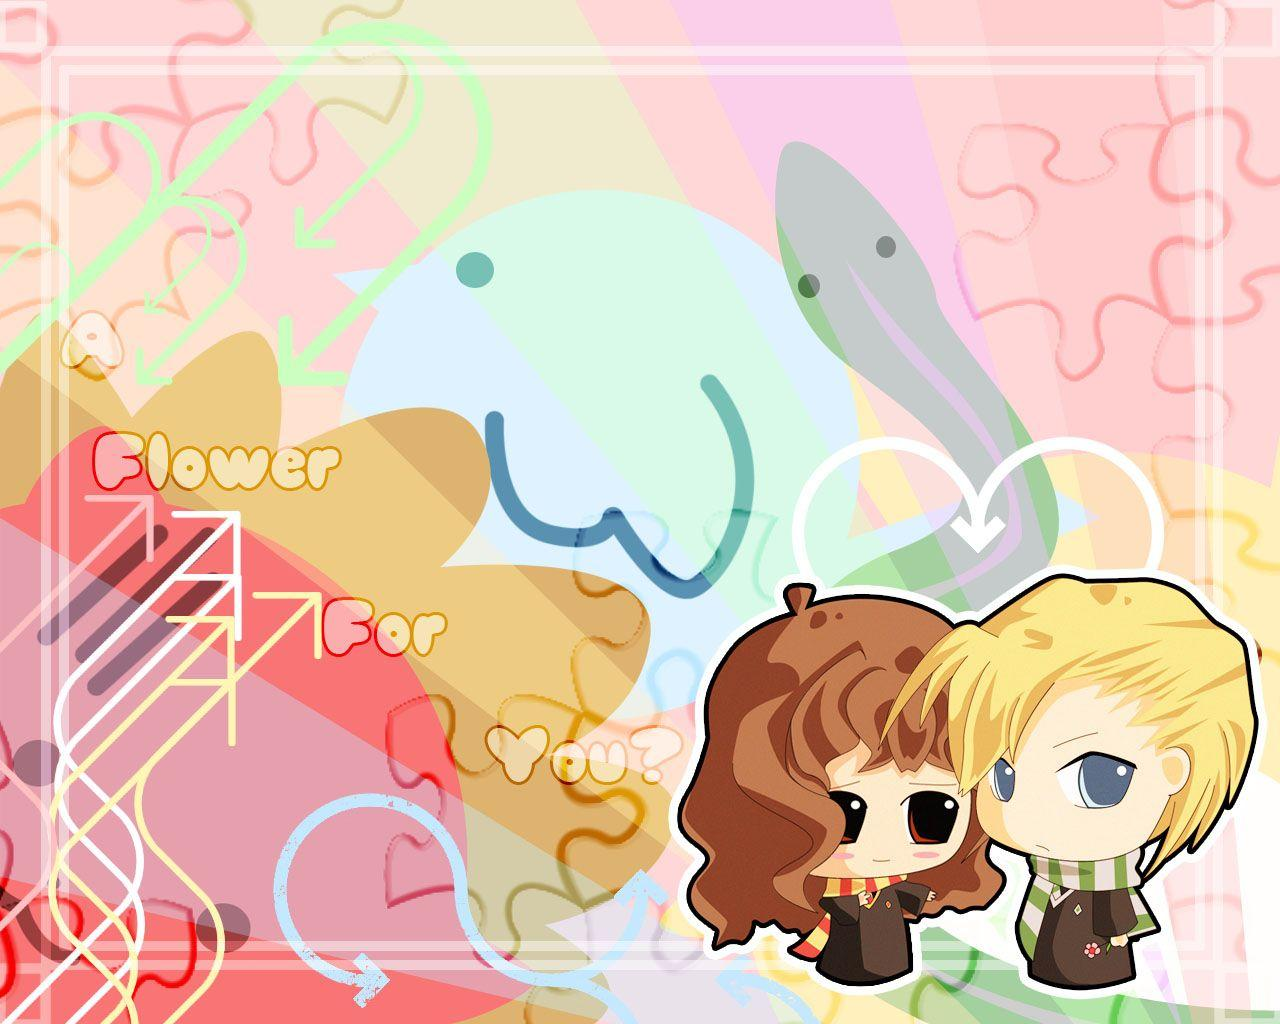 Cute Chibi Wallpapers 1280x1024